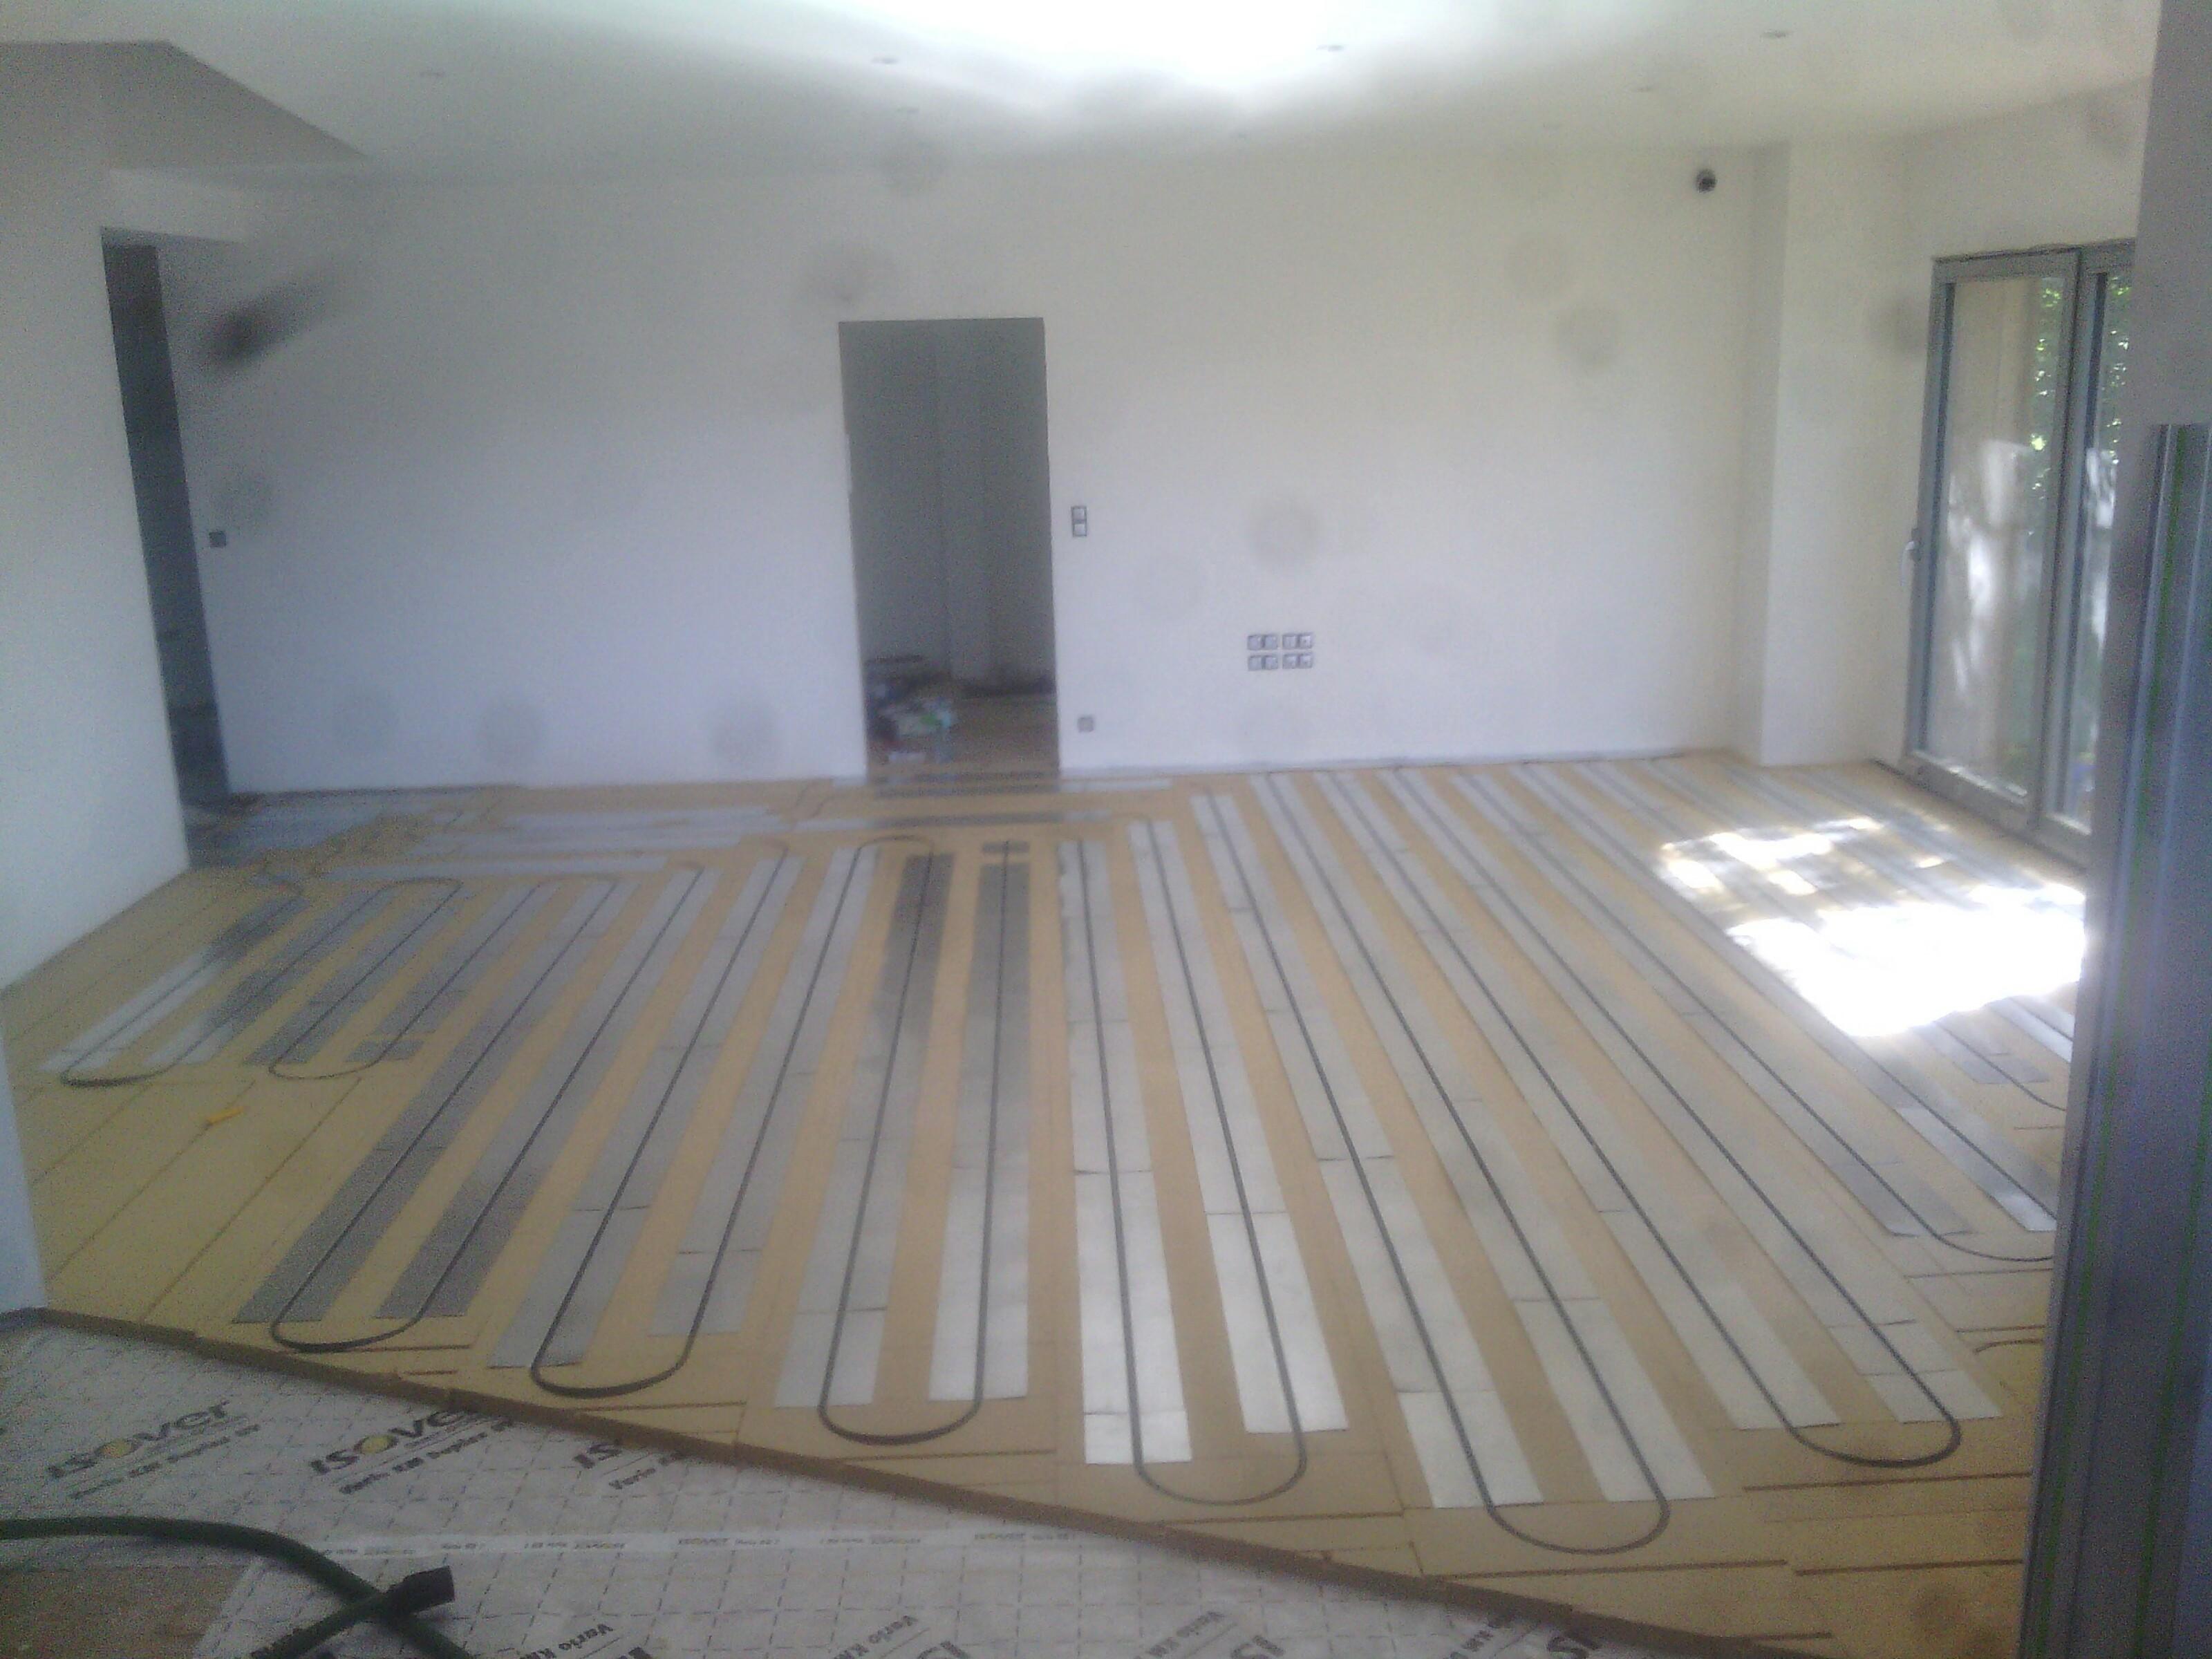 80300 Grandcourt : Pose plancher chauffant RT2020  - vue d'ensemble